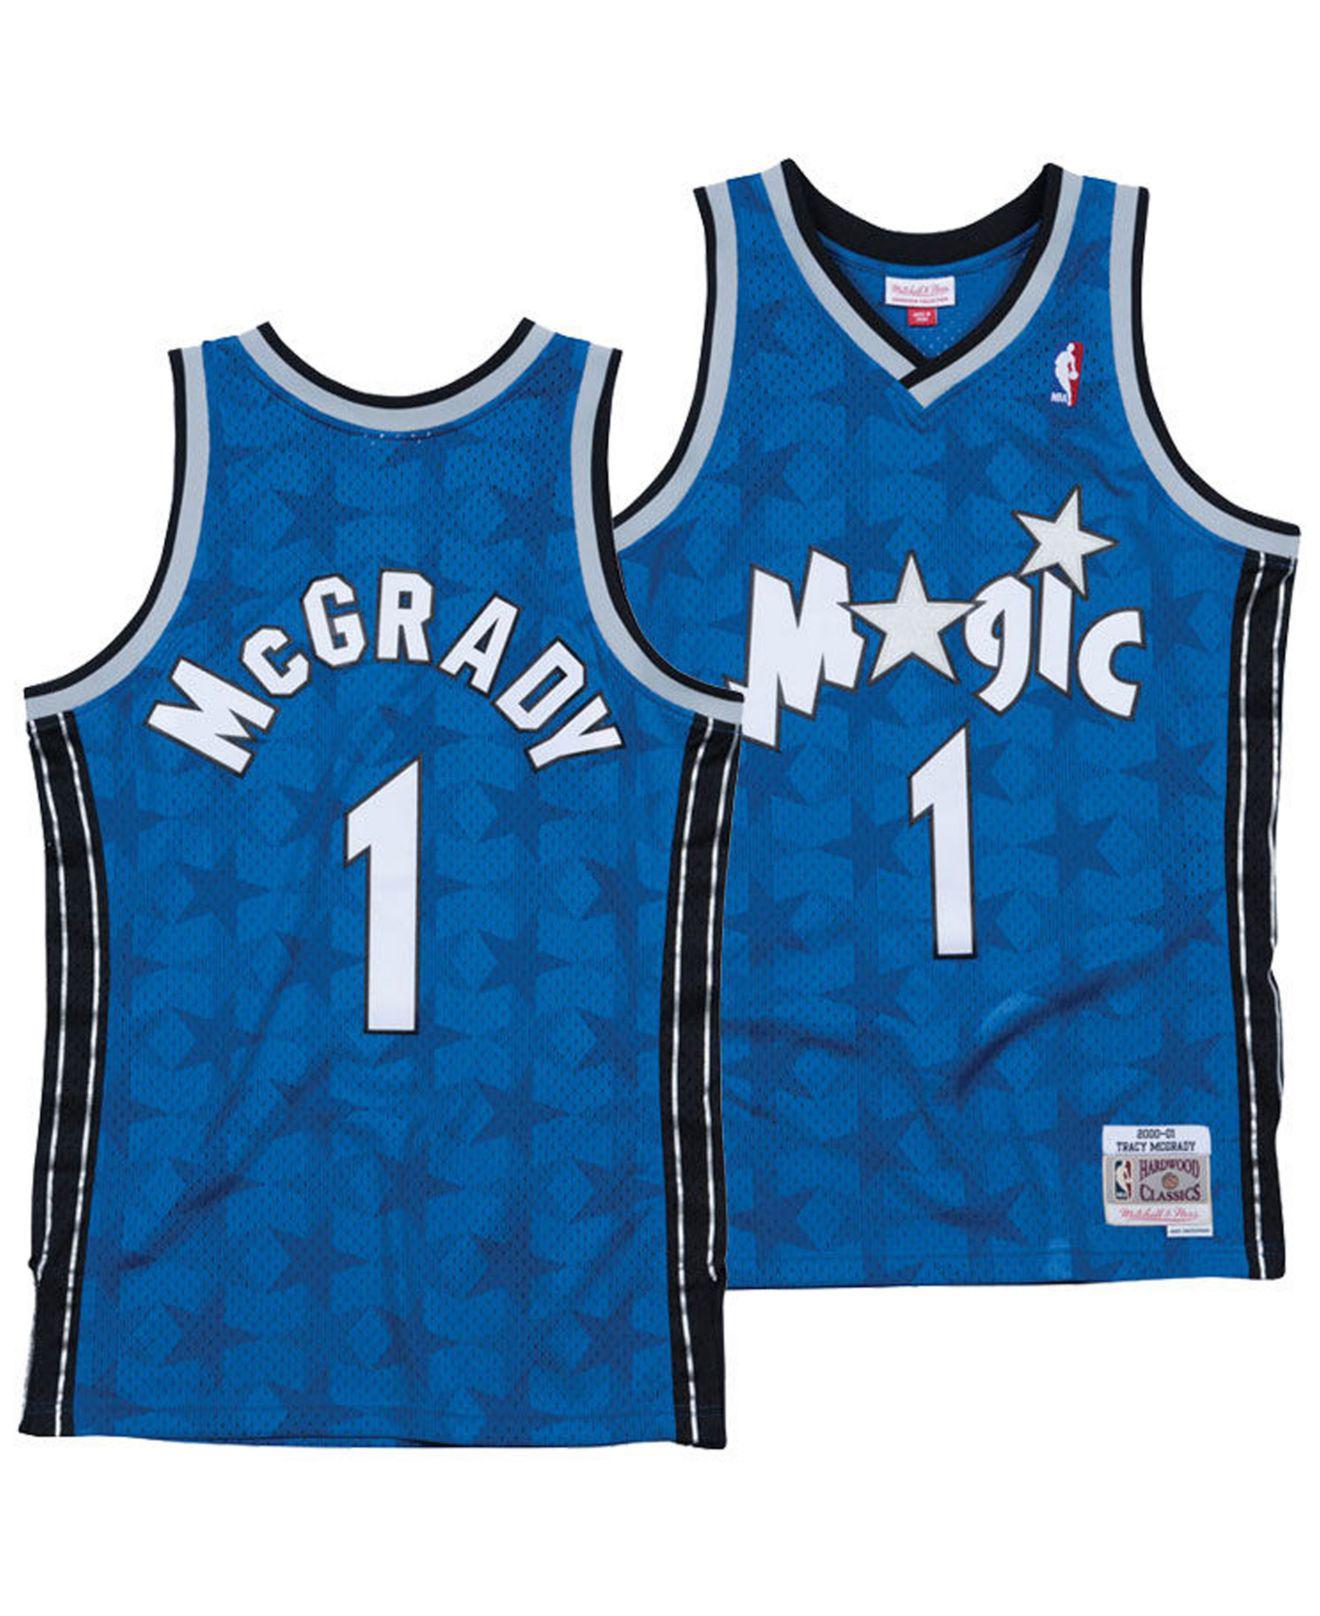 7ed5e6db152 Mitchell   Ness. Men s Blue Tracy Mcgrady Orlando Magic Hardwood Classic  Swingman Jersey .